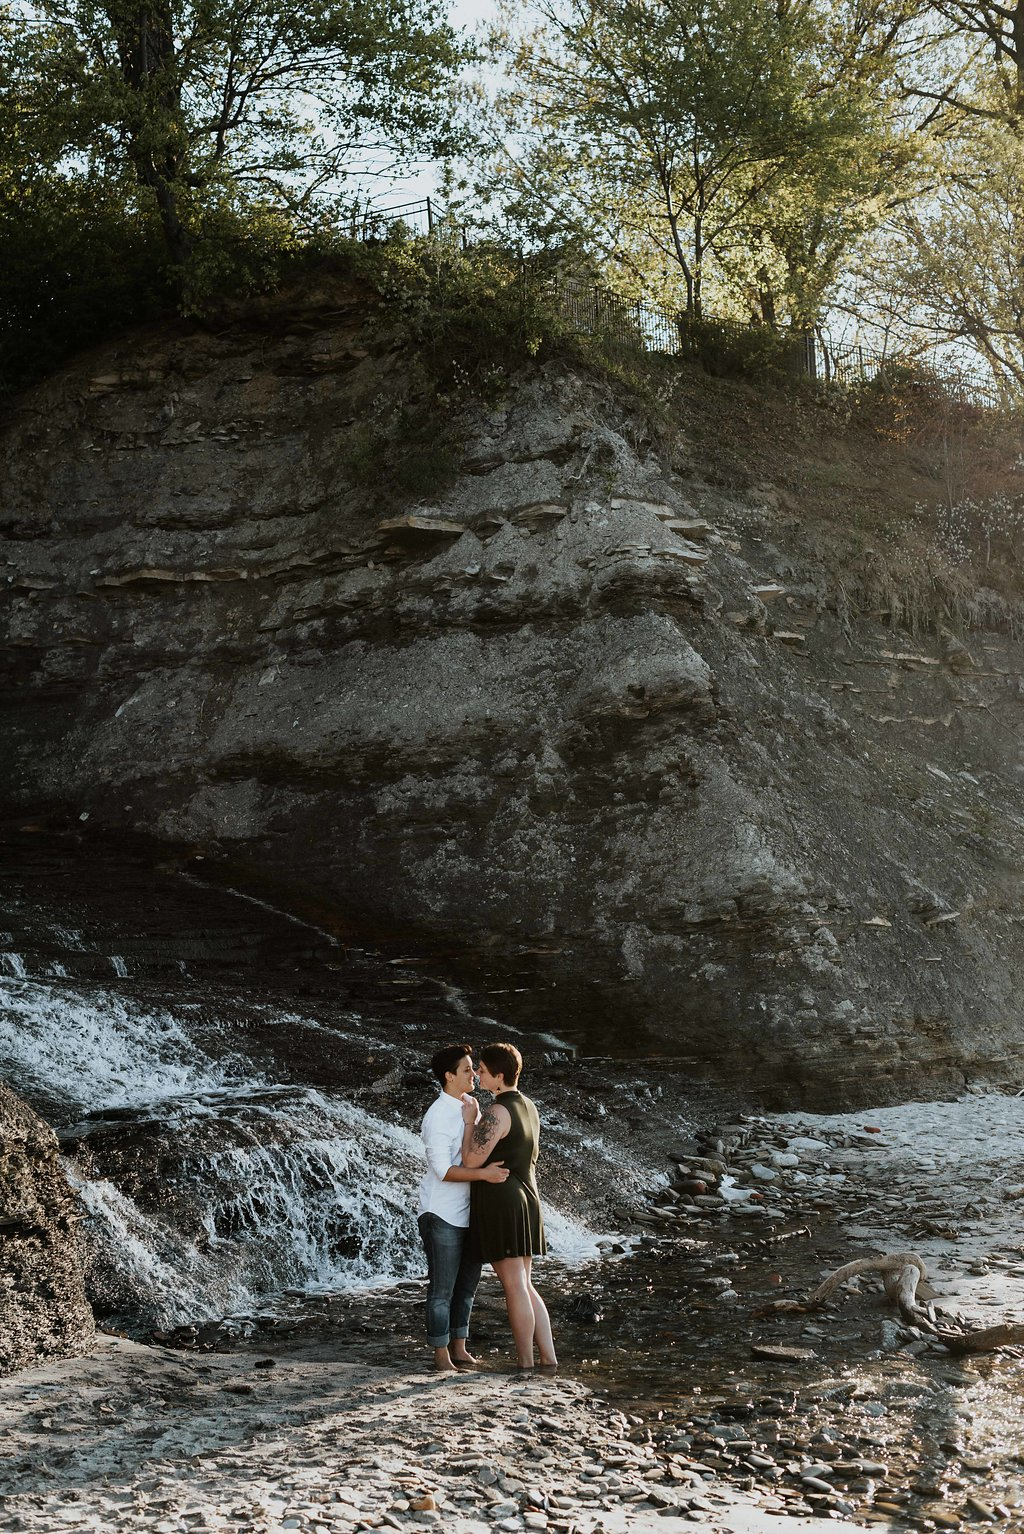 Waterfall-Couples-Session_Em+Katie_MJPHOTO-184.jpg